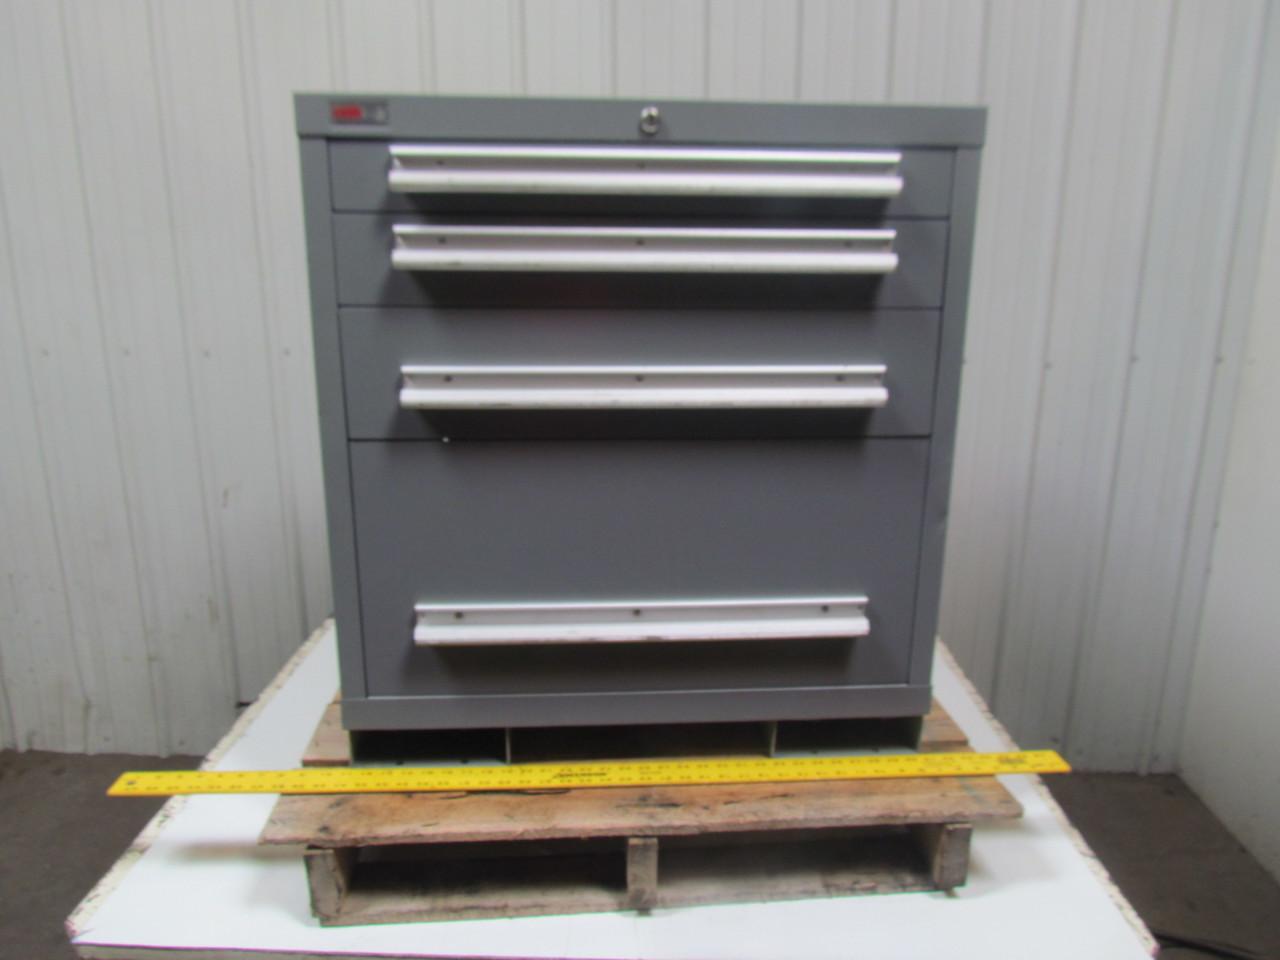 lyon mss ii safetylink 4 drawer industrial storage cabinet 30x27 3 4x32 ebay. Black Bedroom Furniture Sets. Home Design Ideas